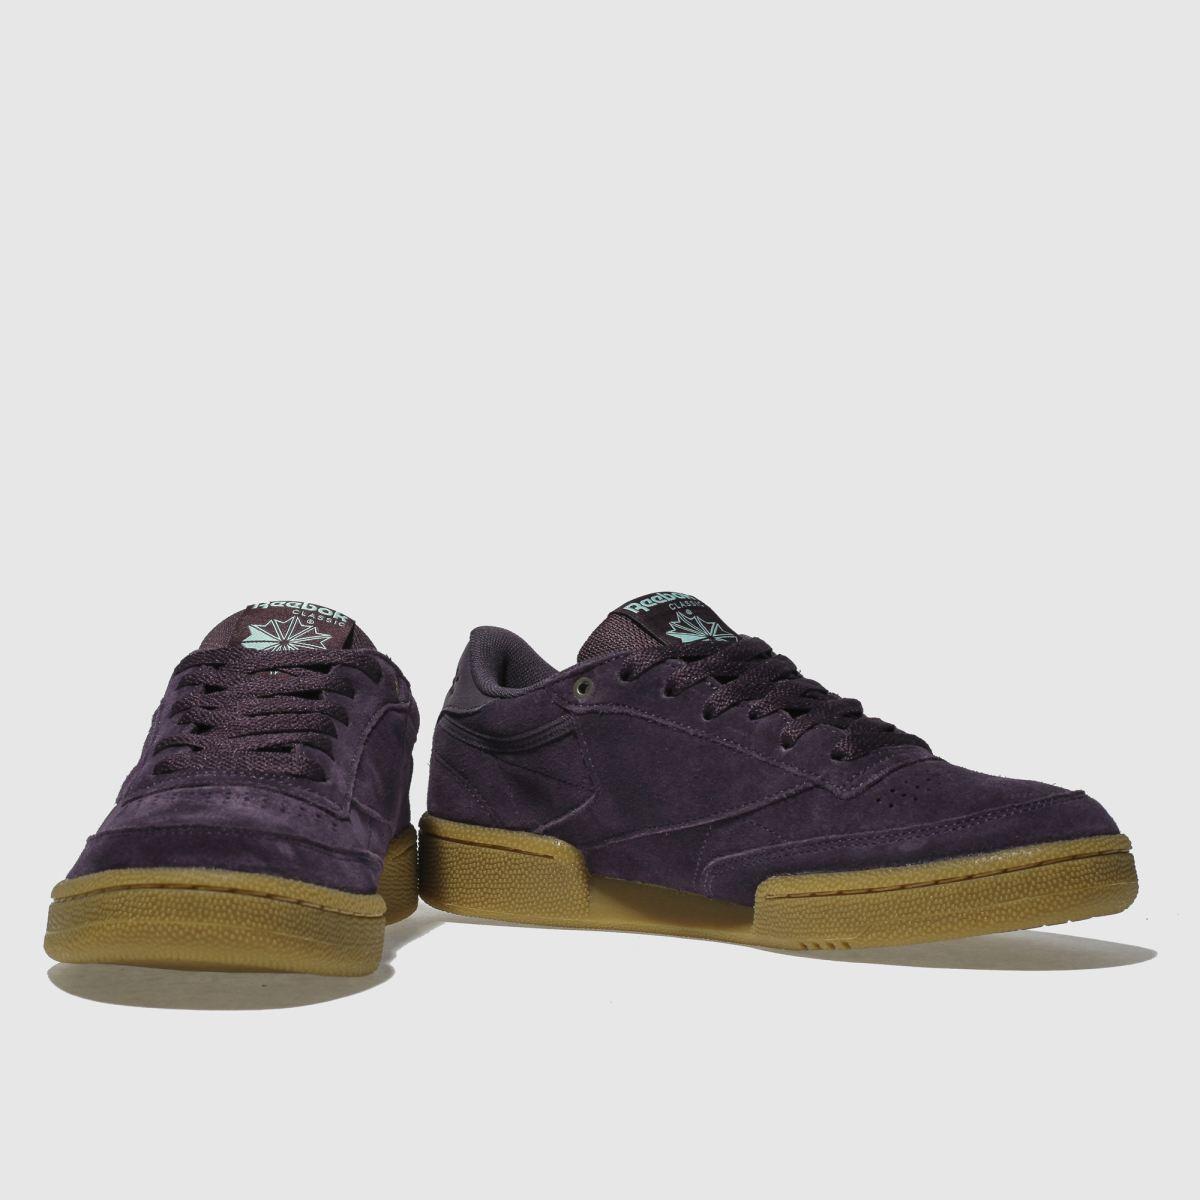 Damen Violett reebok Club C 85 Fvs Gute Gum Sneaker | schuh Gute Fvs Qualität beliebte Schuhe f948c1